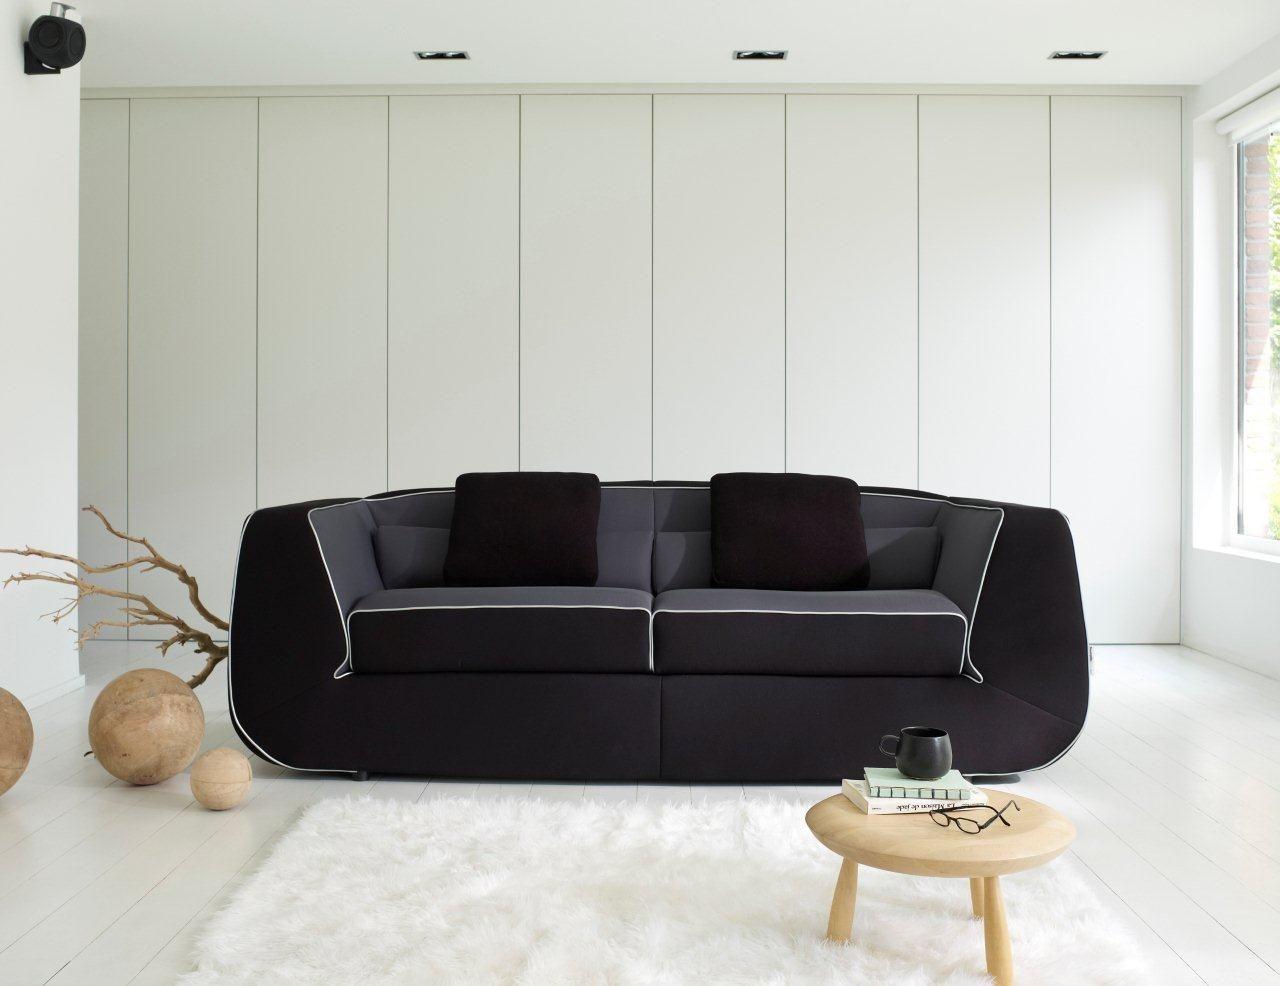 canap droit bump by ora ito 2 3 places l 198 cm. Black Bedroom Furniture Sets. Home Design Ideas